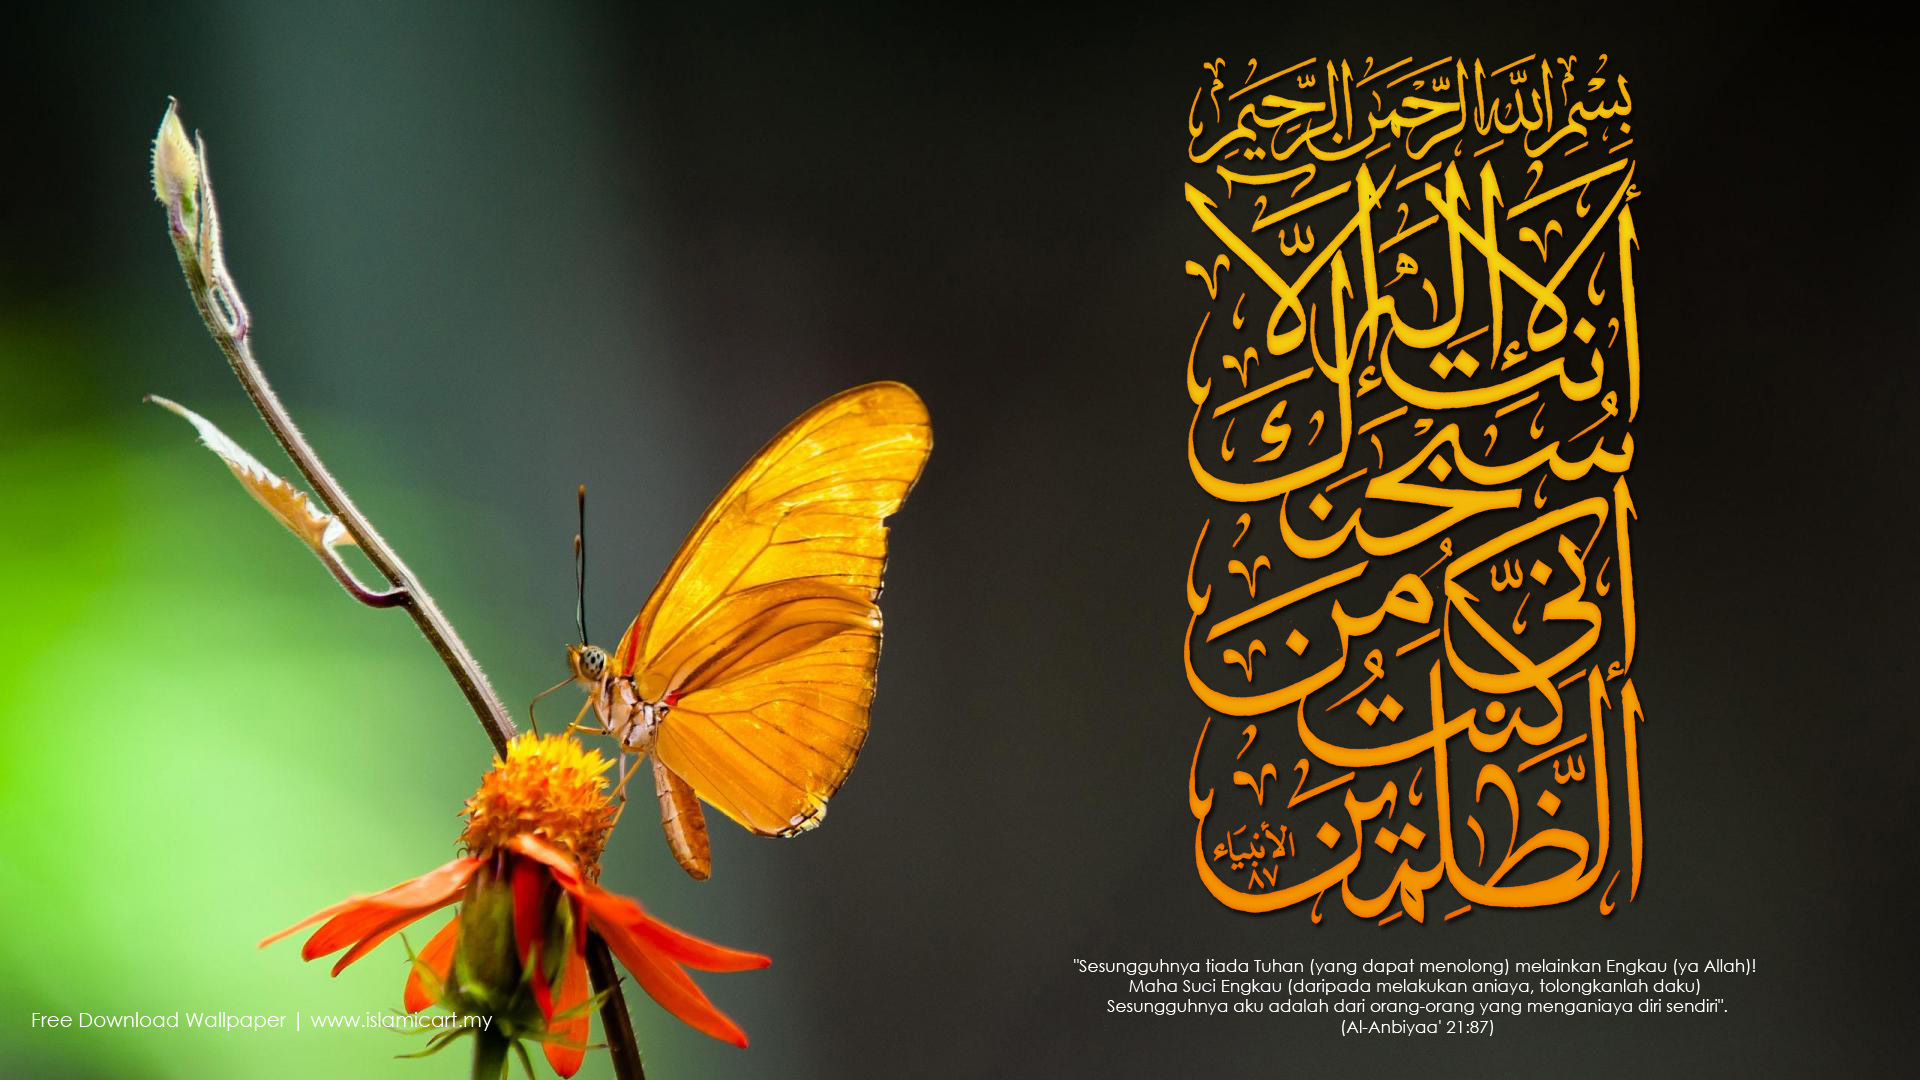 free download wallpapers arab - photo #25